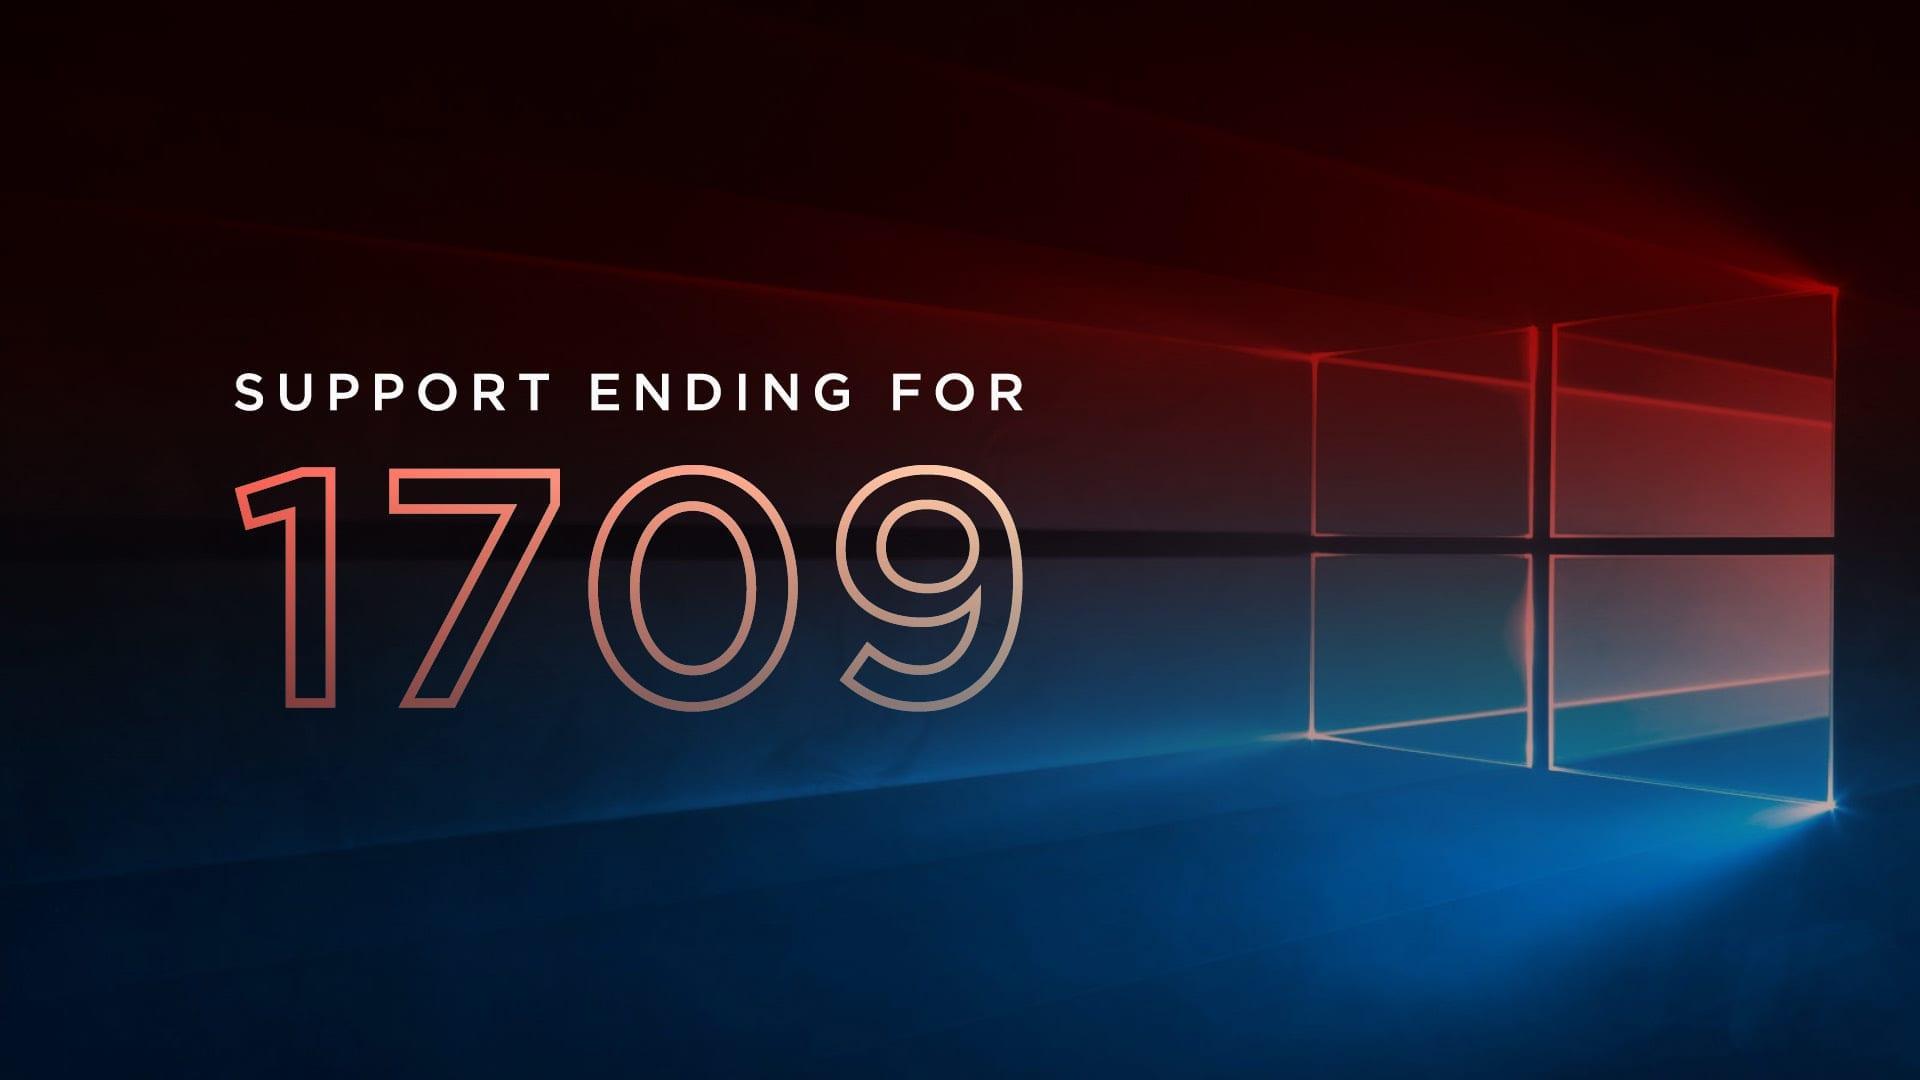 Support Ending for Windows 1709